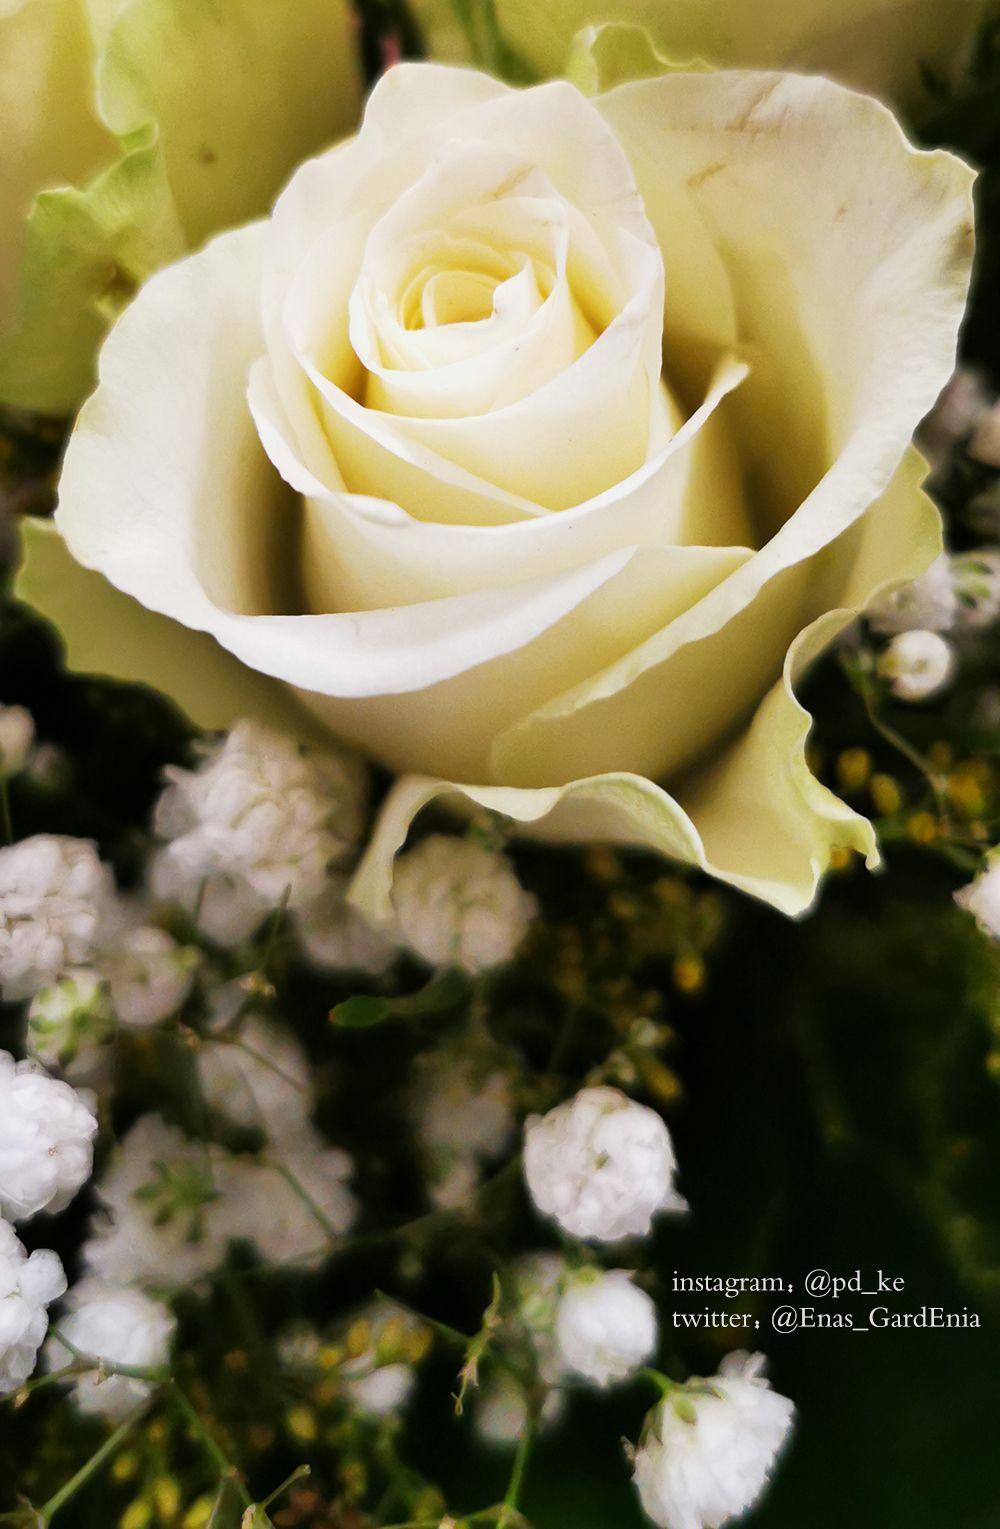 Snapchat Enasart Www Instagram Com Pd Ke تصويري ايناس الغاردينيا تصوير جوال تصوير السعودية جدة بني مالك الجنوب جنوب ال In 2020 Arabic Books Flowers Rose